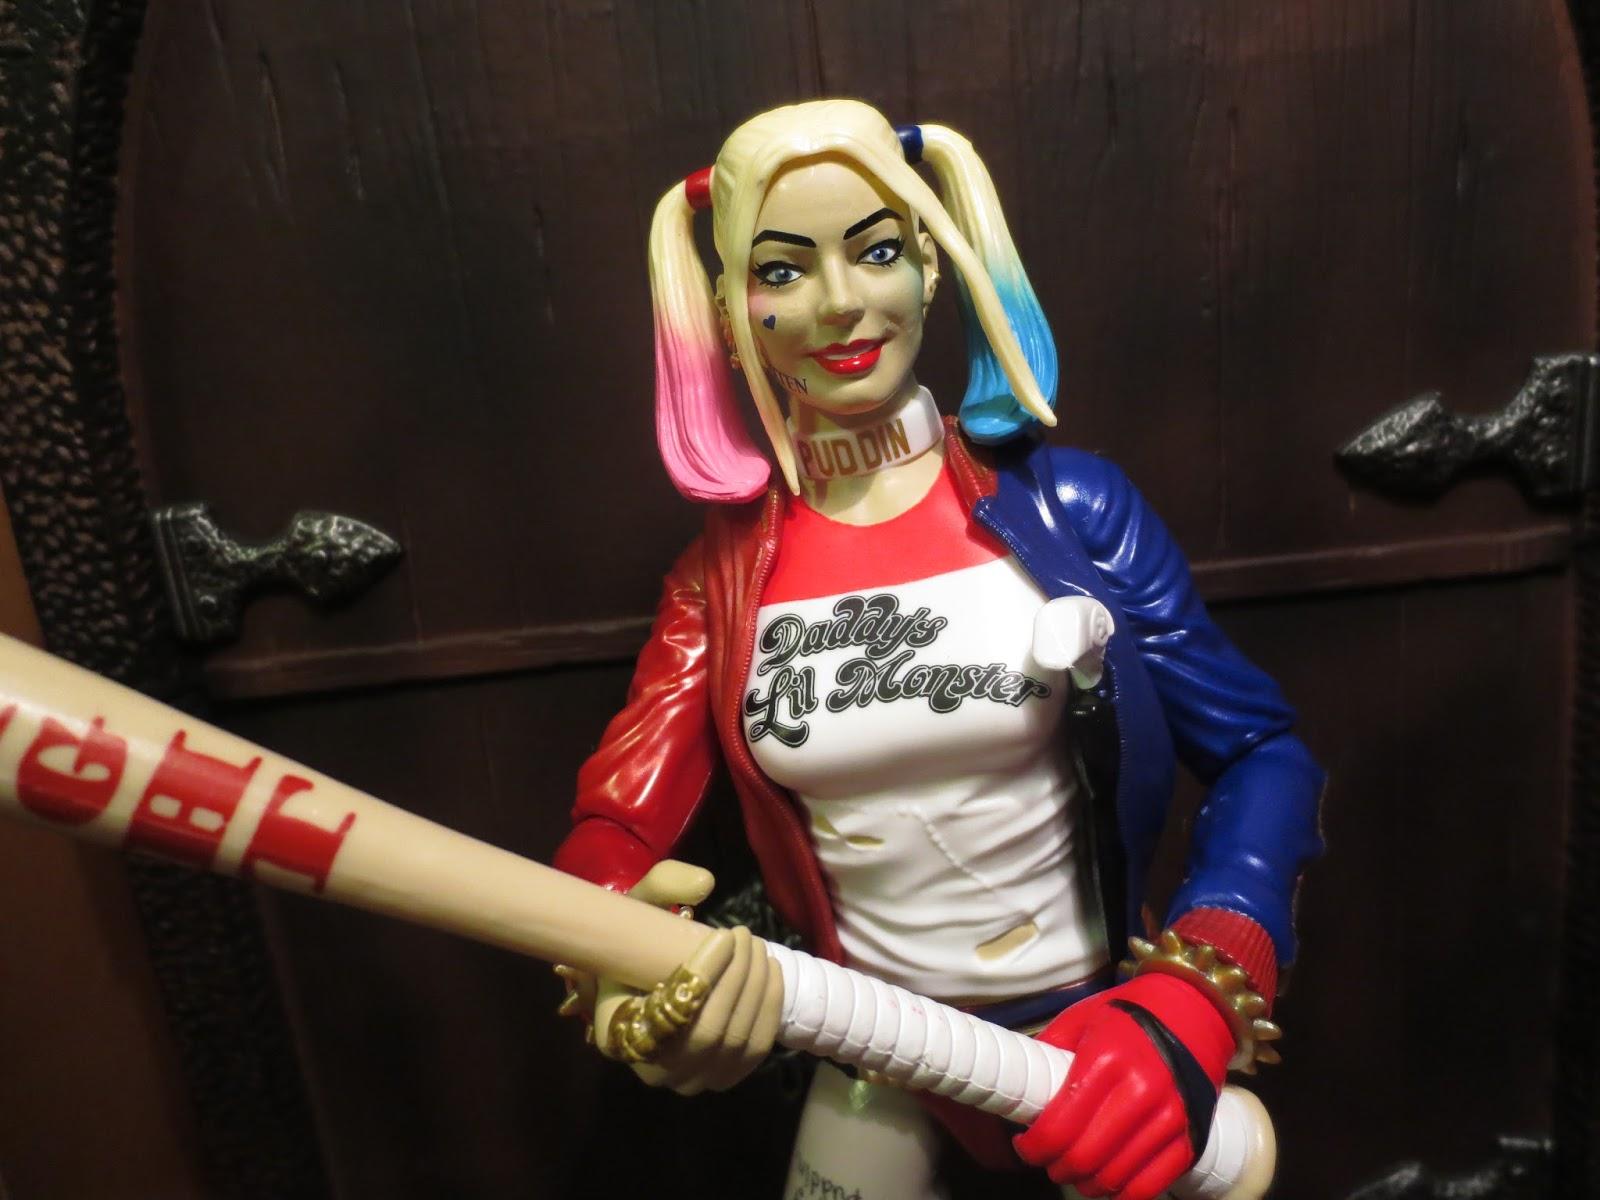 DC Comics Multiverse Suicide Squad Harley Quinn 12 Figure